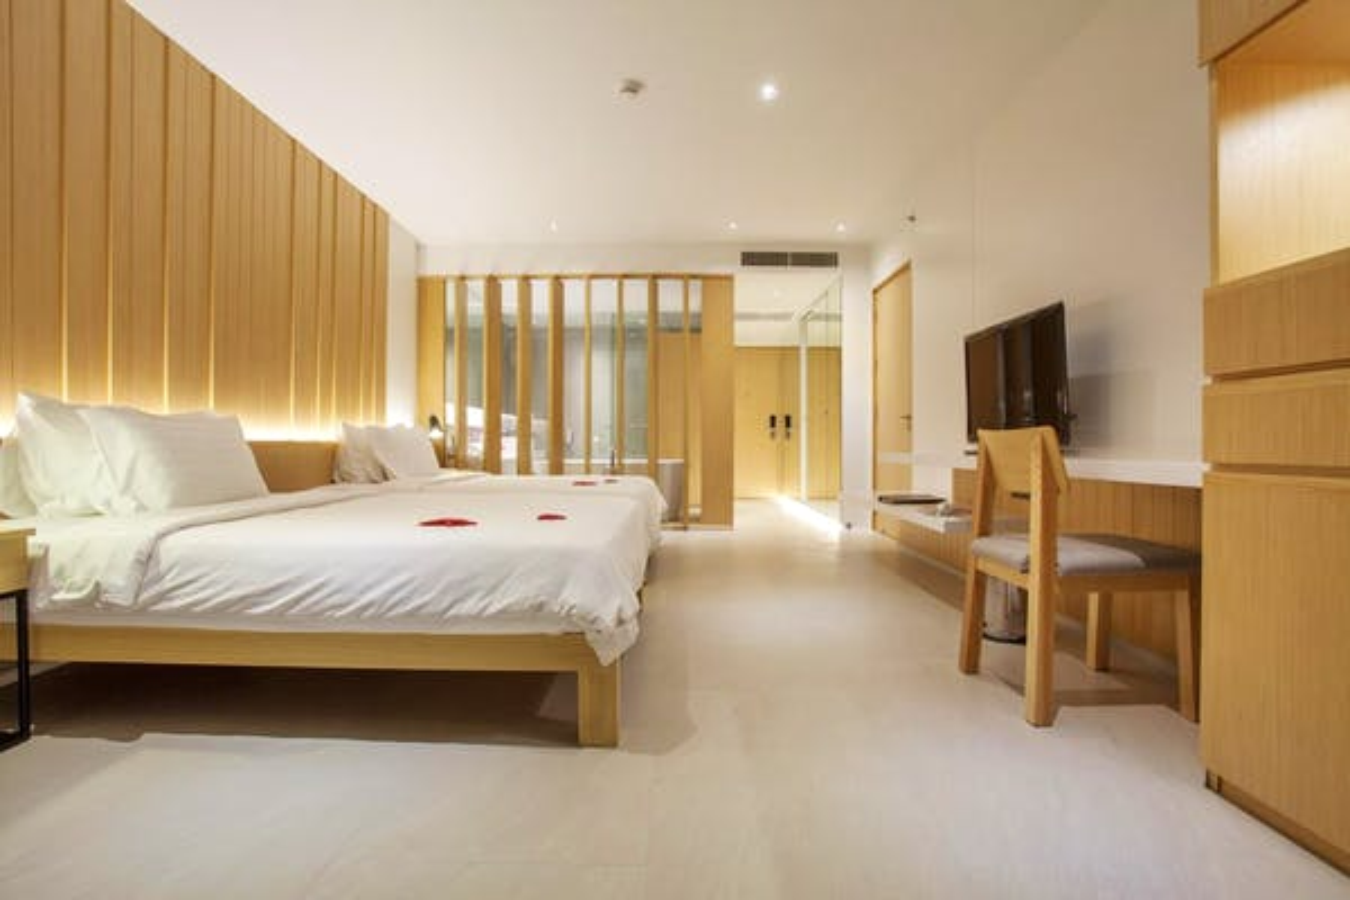 Ramada Resort by Wyndham Khao Lak - Image 1